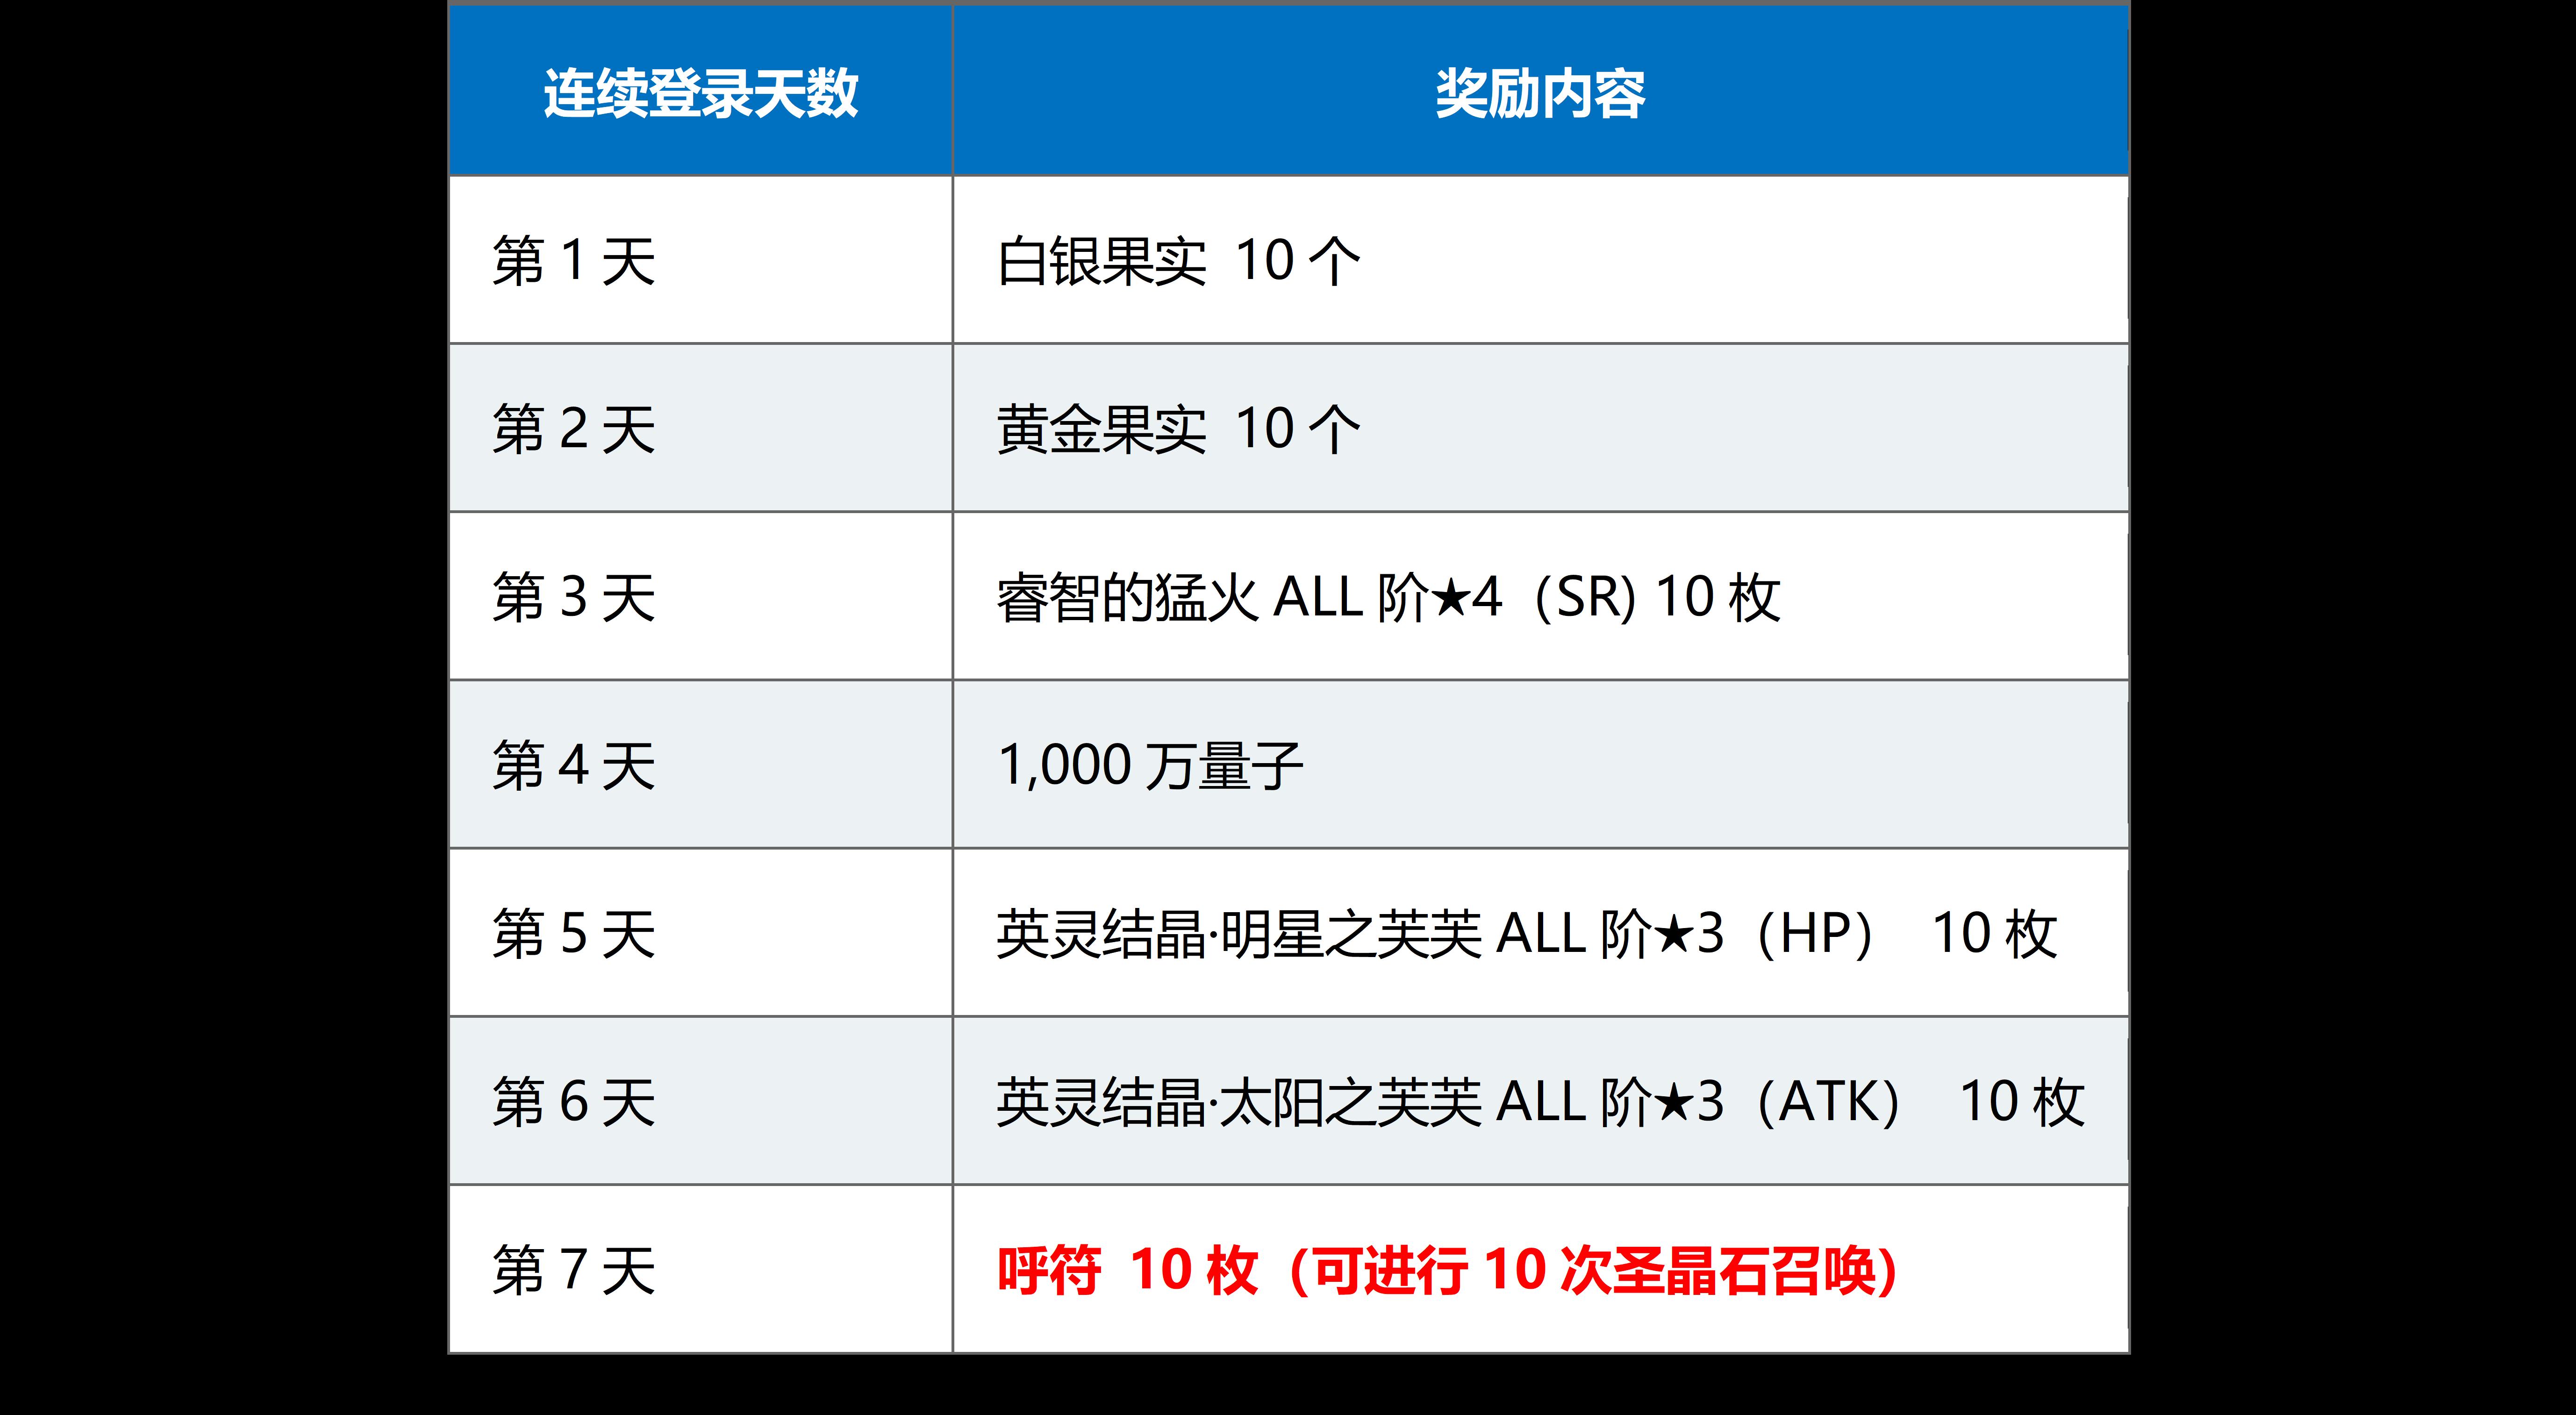 《FGO》国服1500w下载连续签到领奖励活动